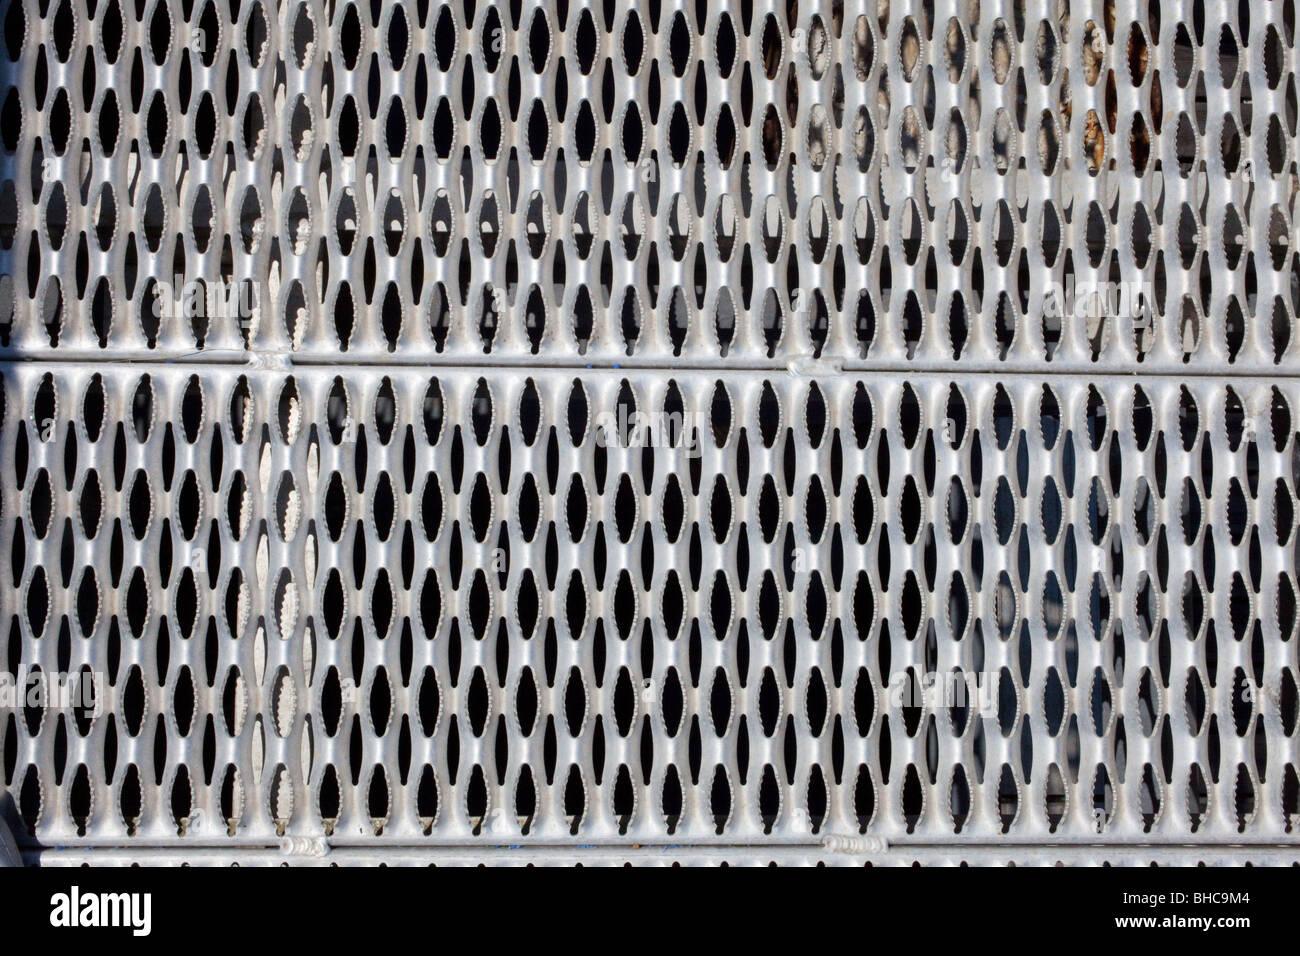 Grid background - Stock Image